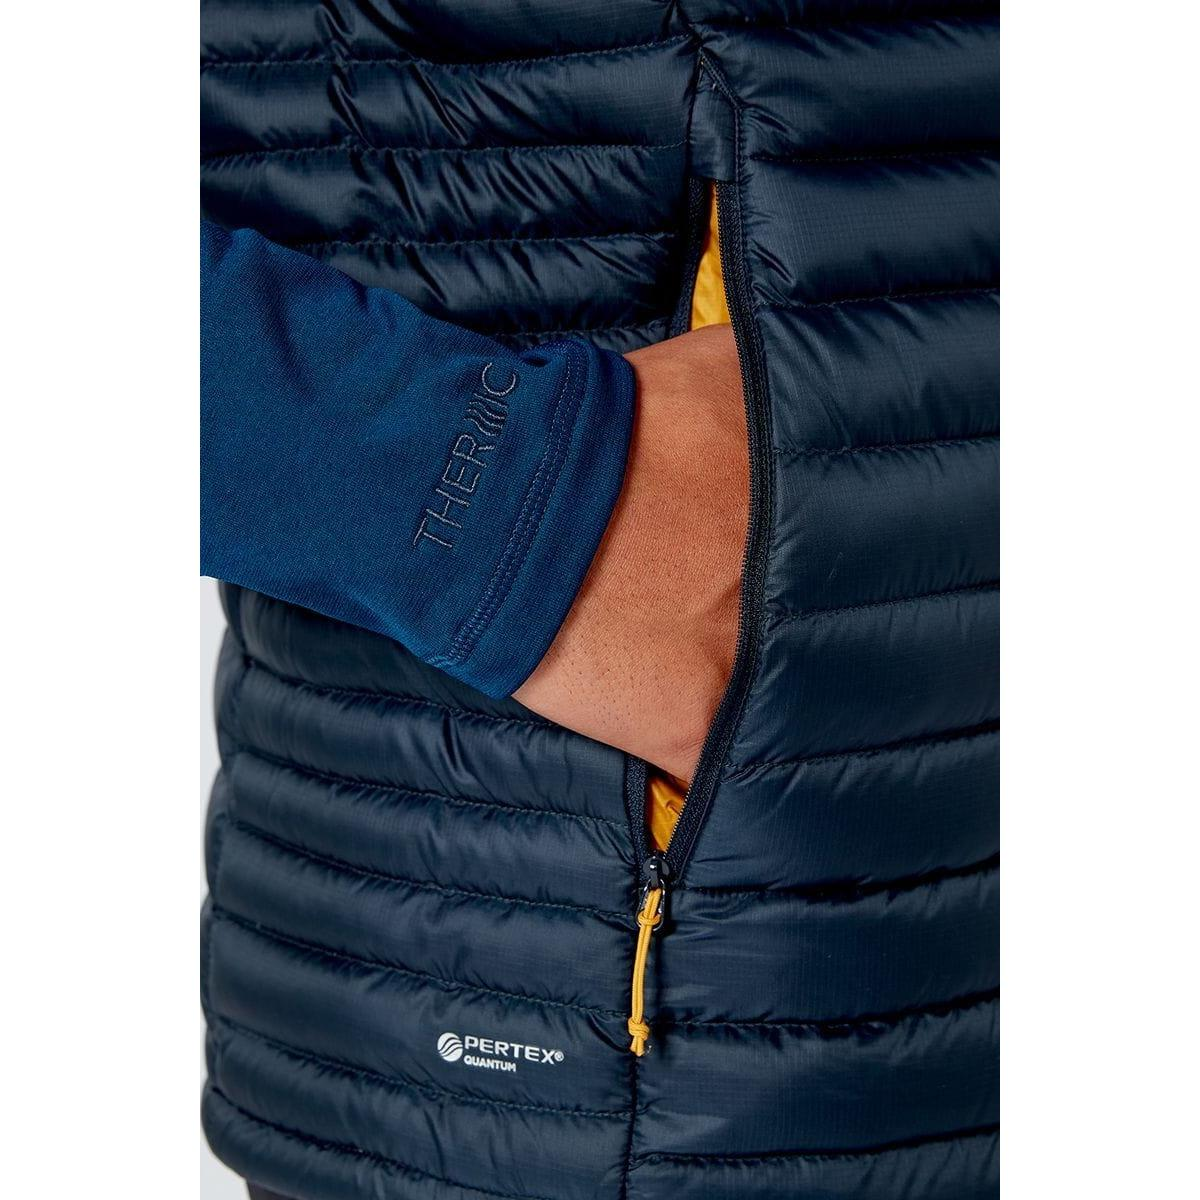 Rab Men's Rab Microlight Vest - Grey